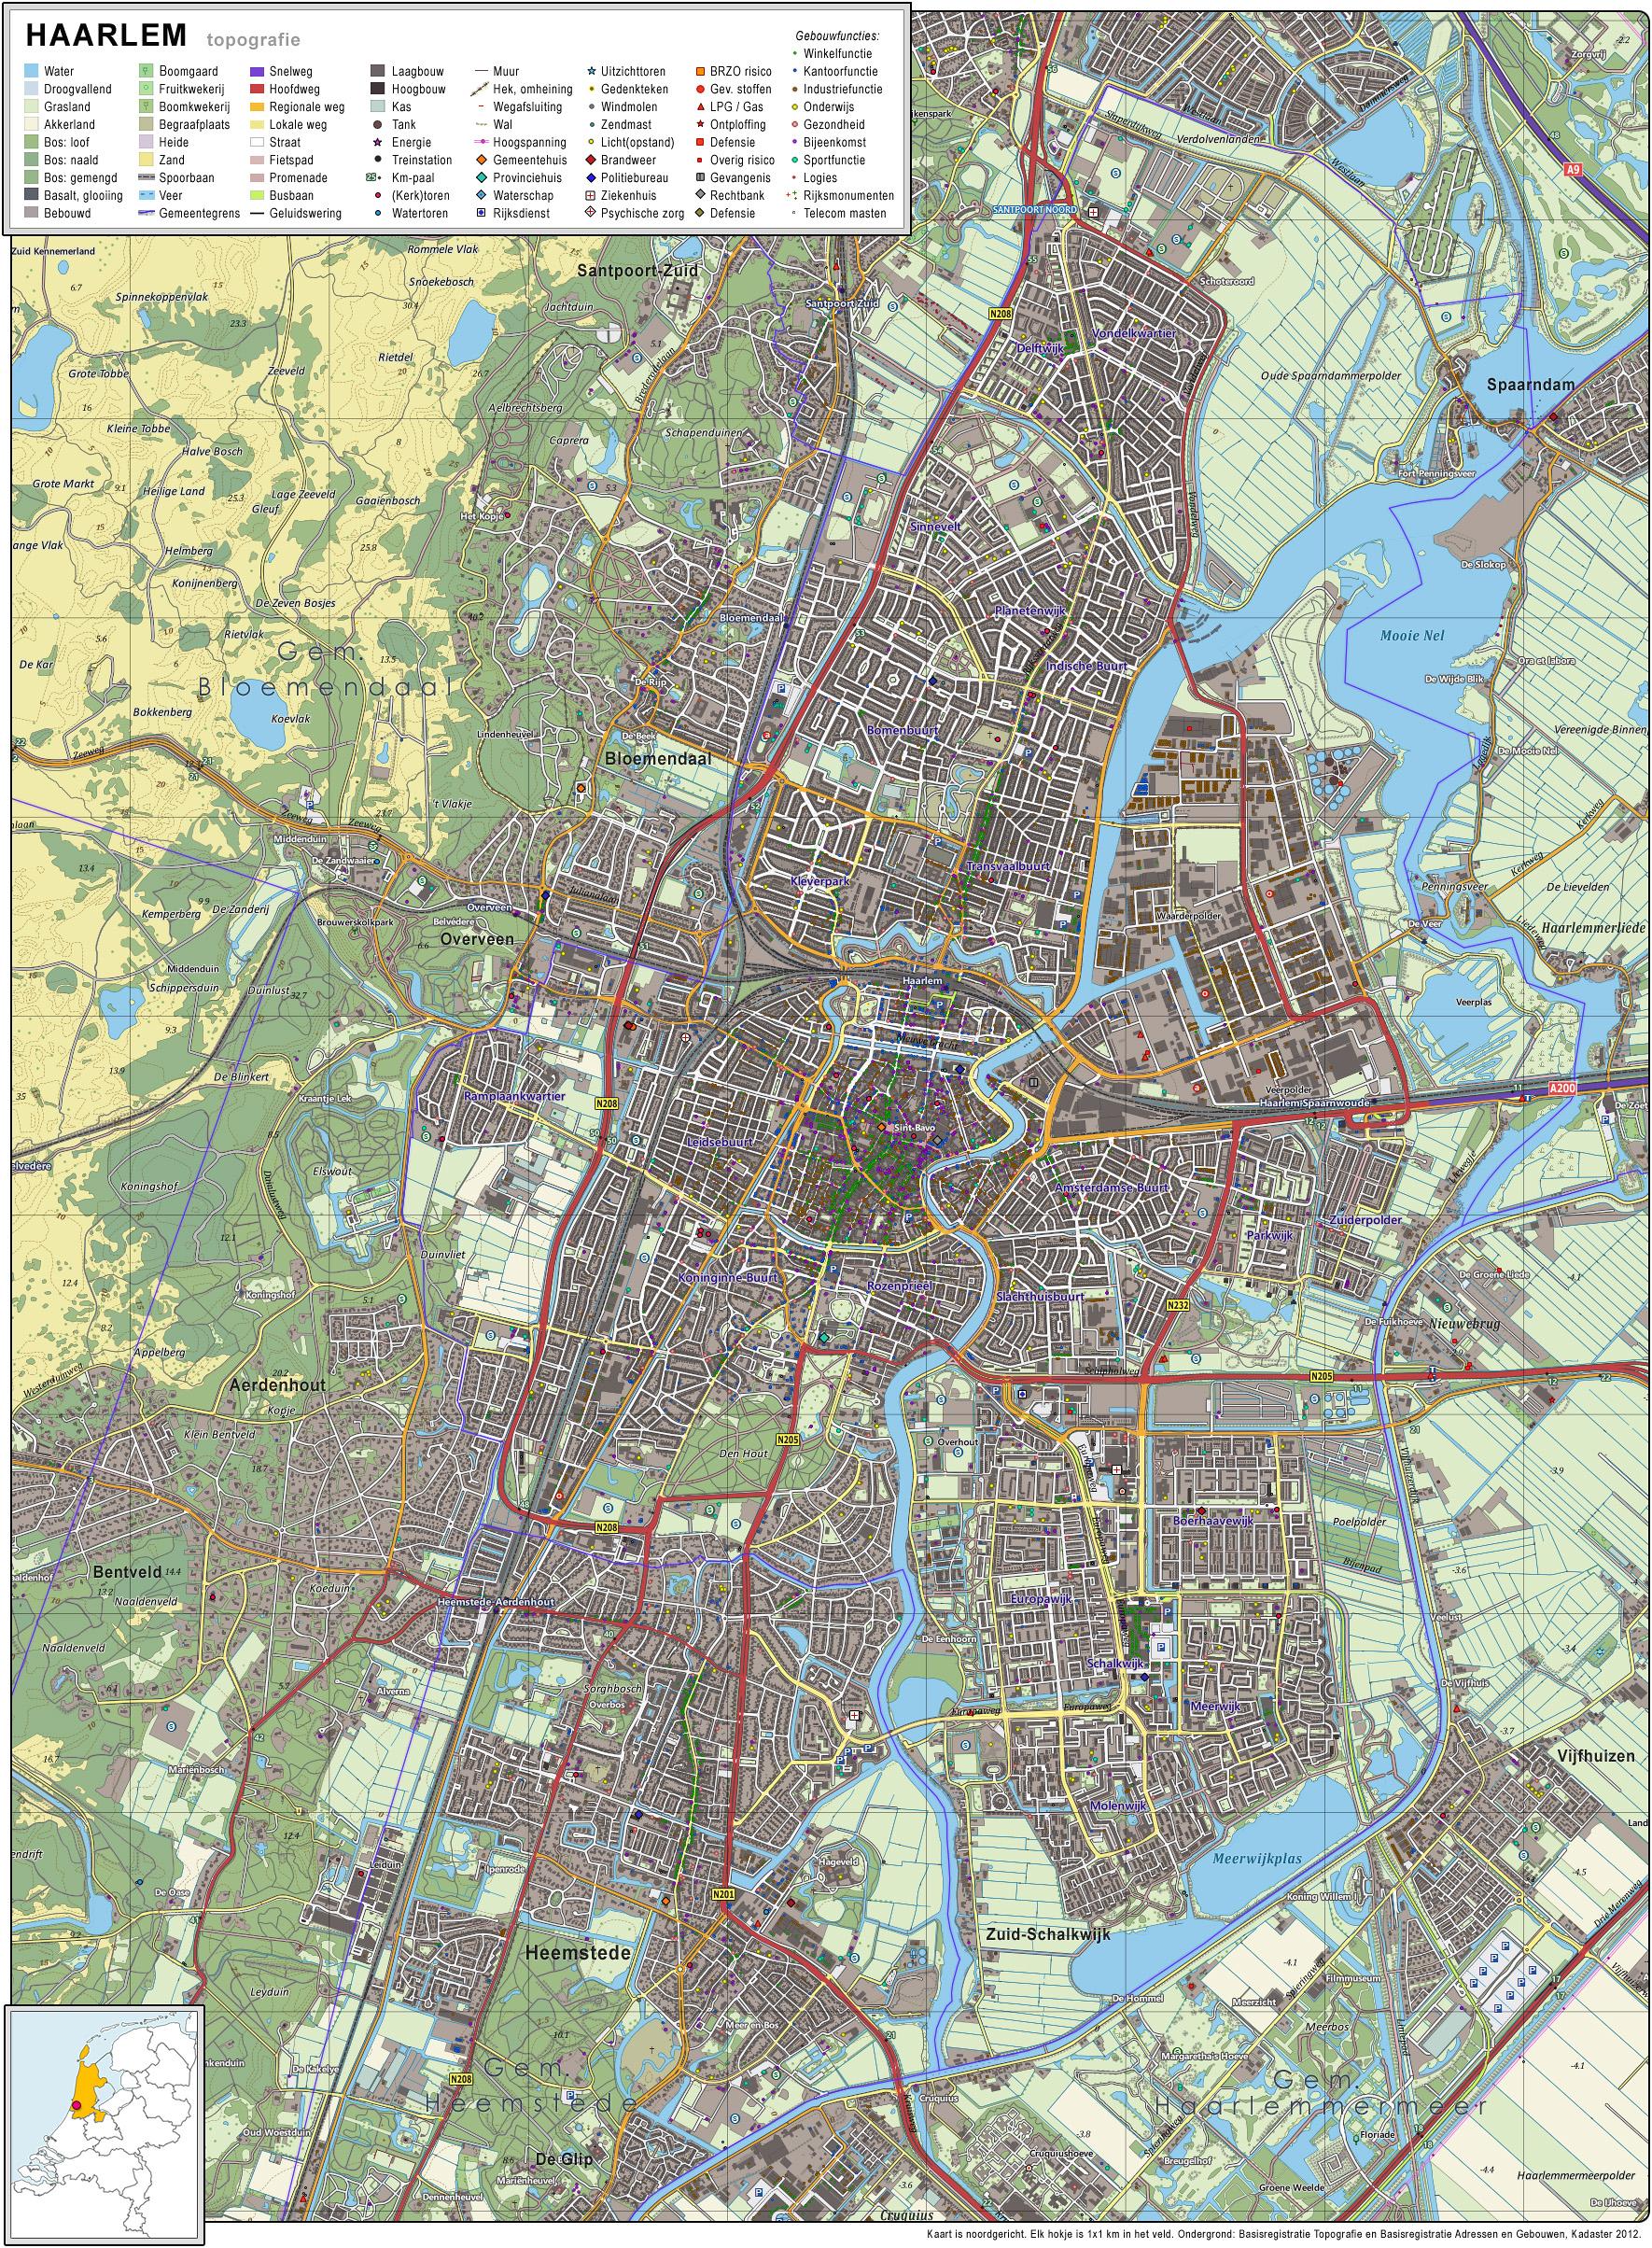 Haarlem | Familypedia | FANDOM powered by Wikia